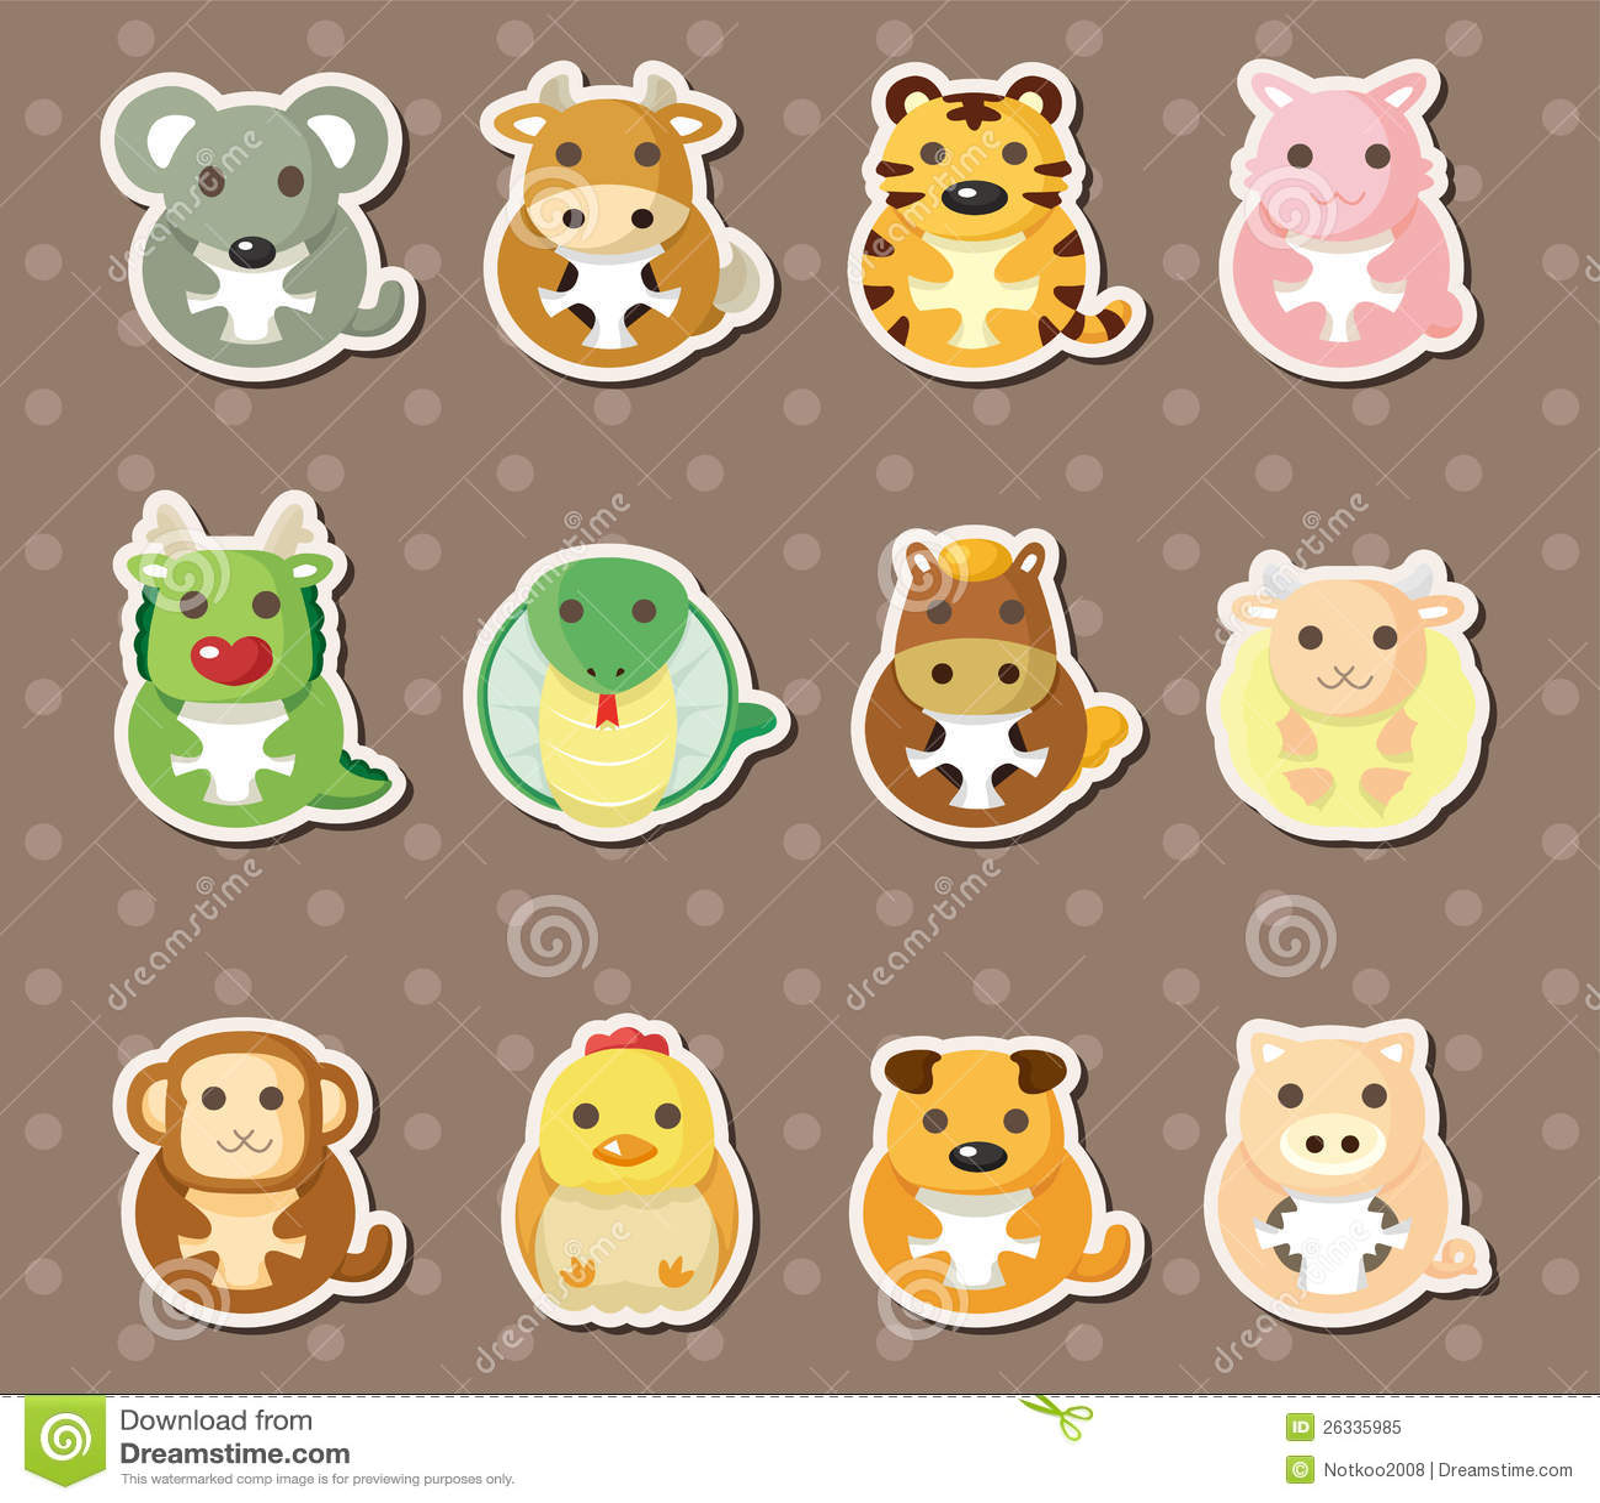 12 Chinese Zodiac Animal Stickers Royalty Free Stock Photo - Image ...